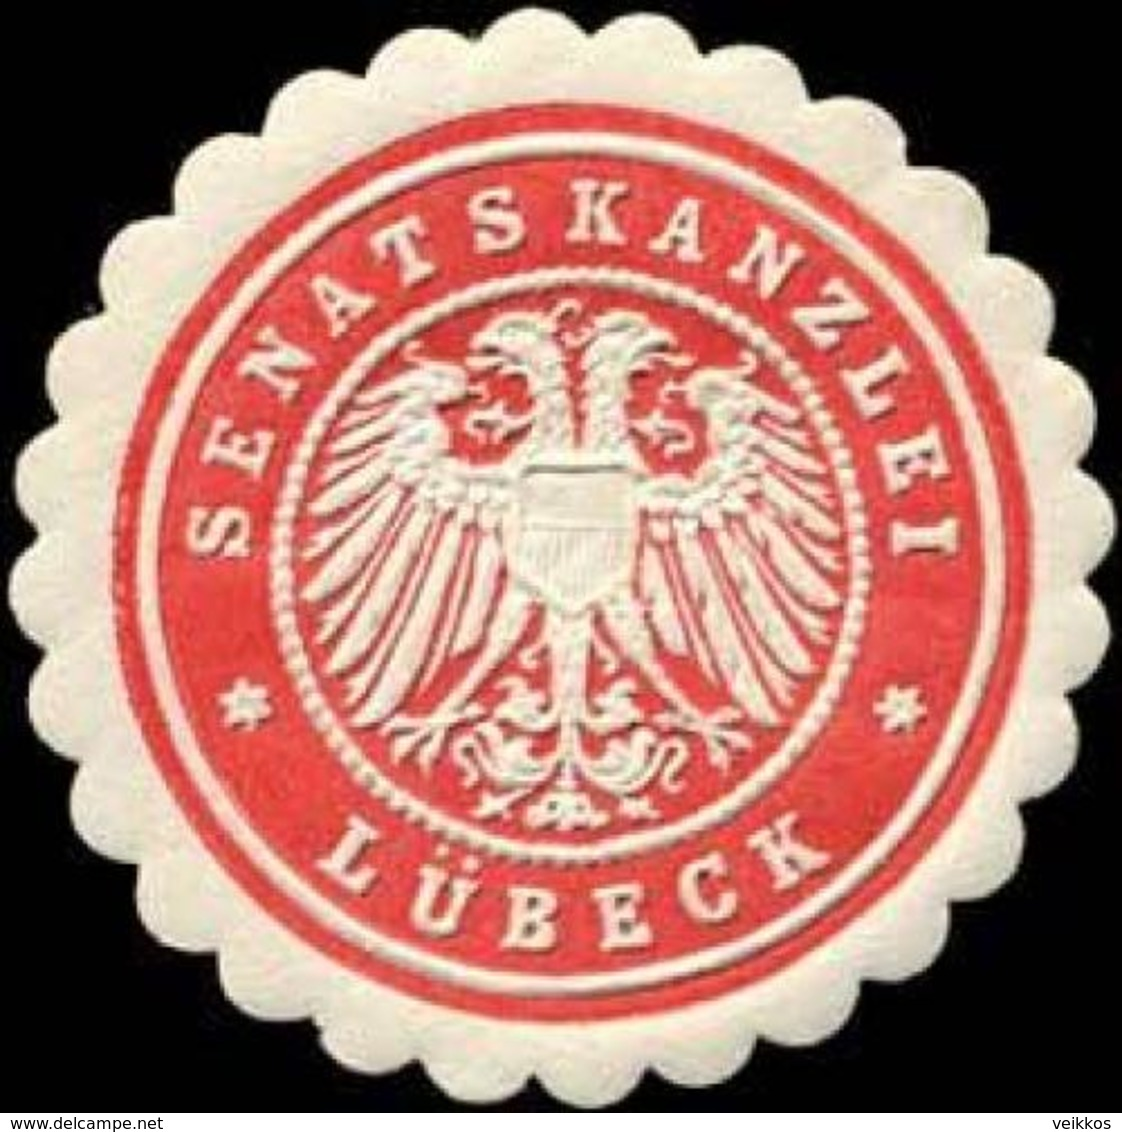 Lübeck: Senatskanzlei Lübeck Siegelmarke - Cinderellas